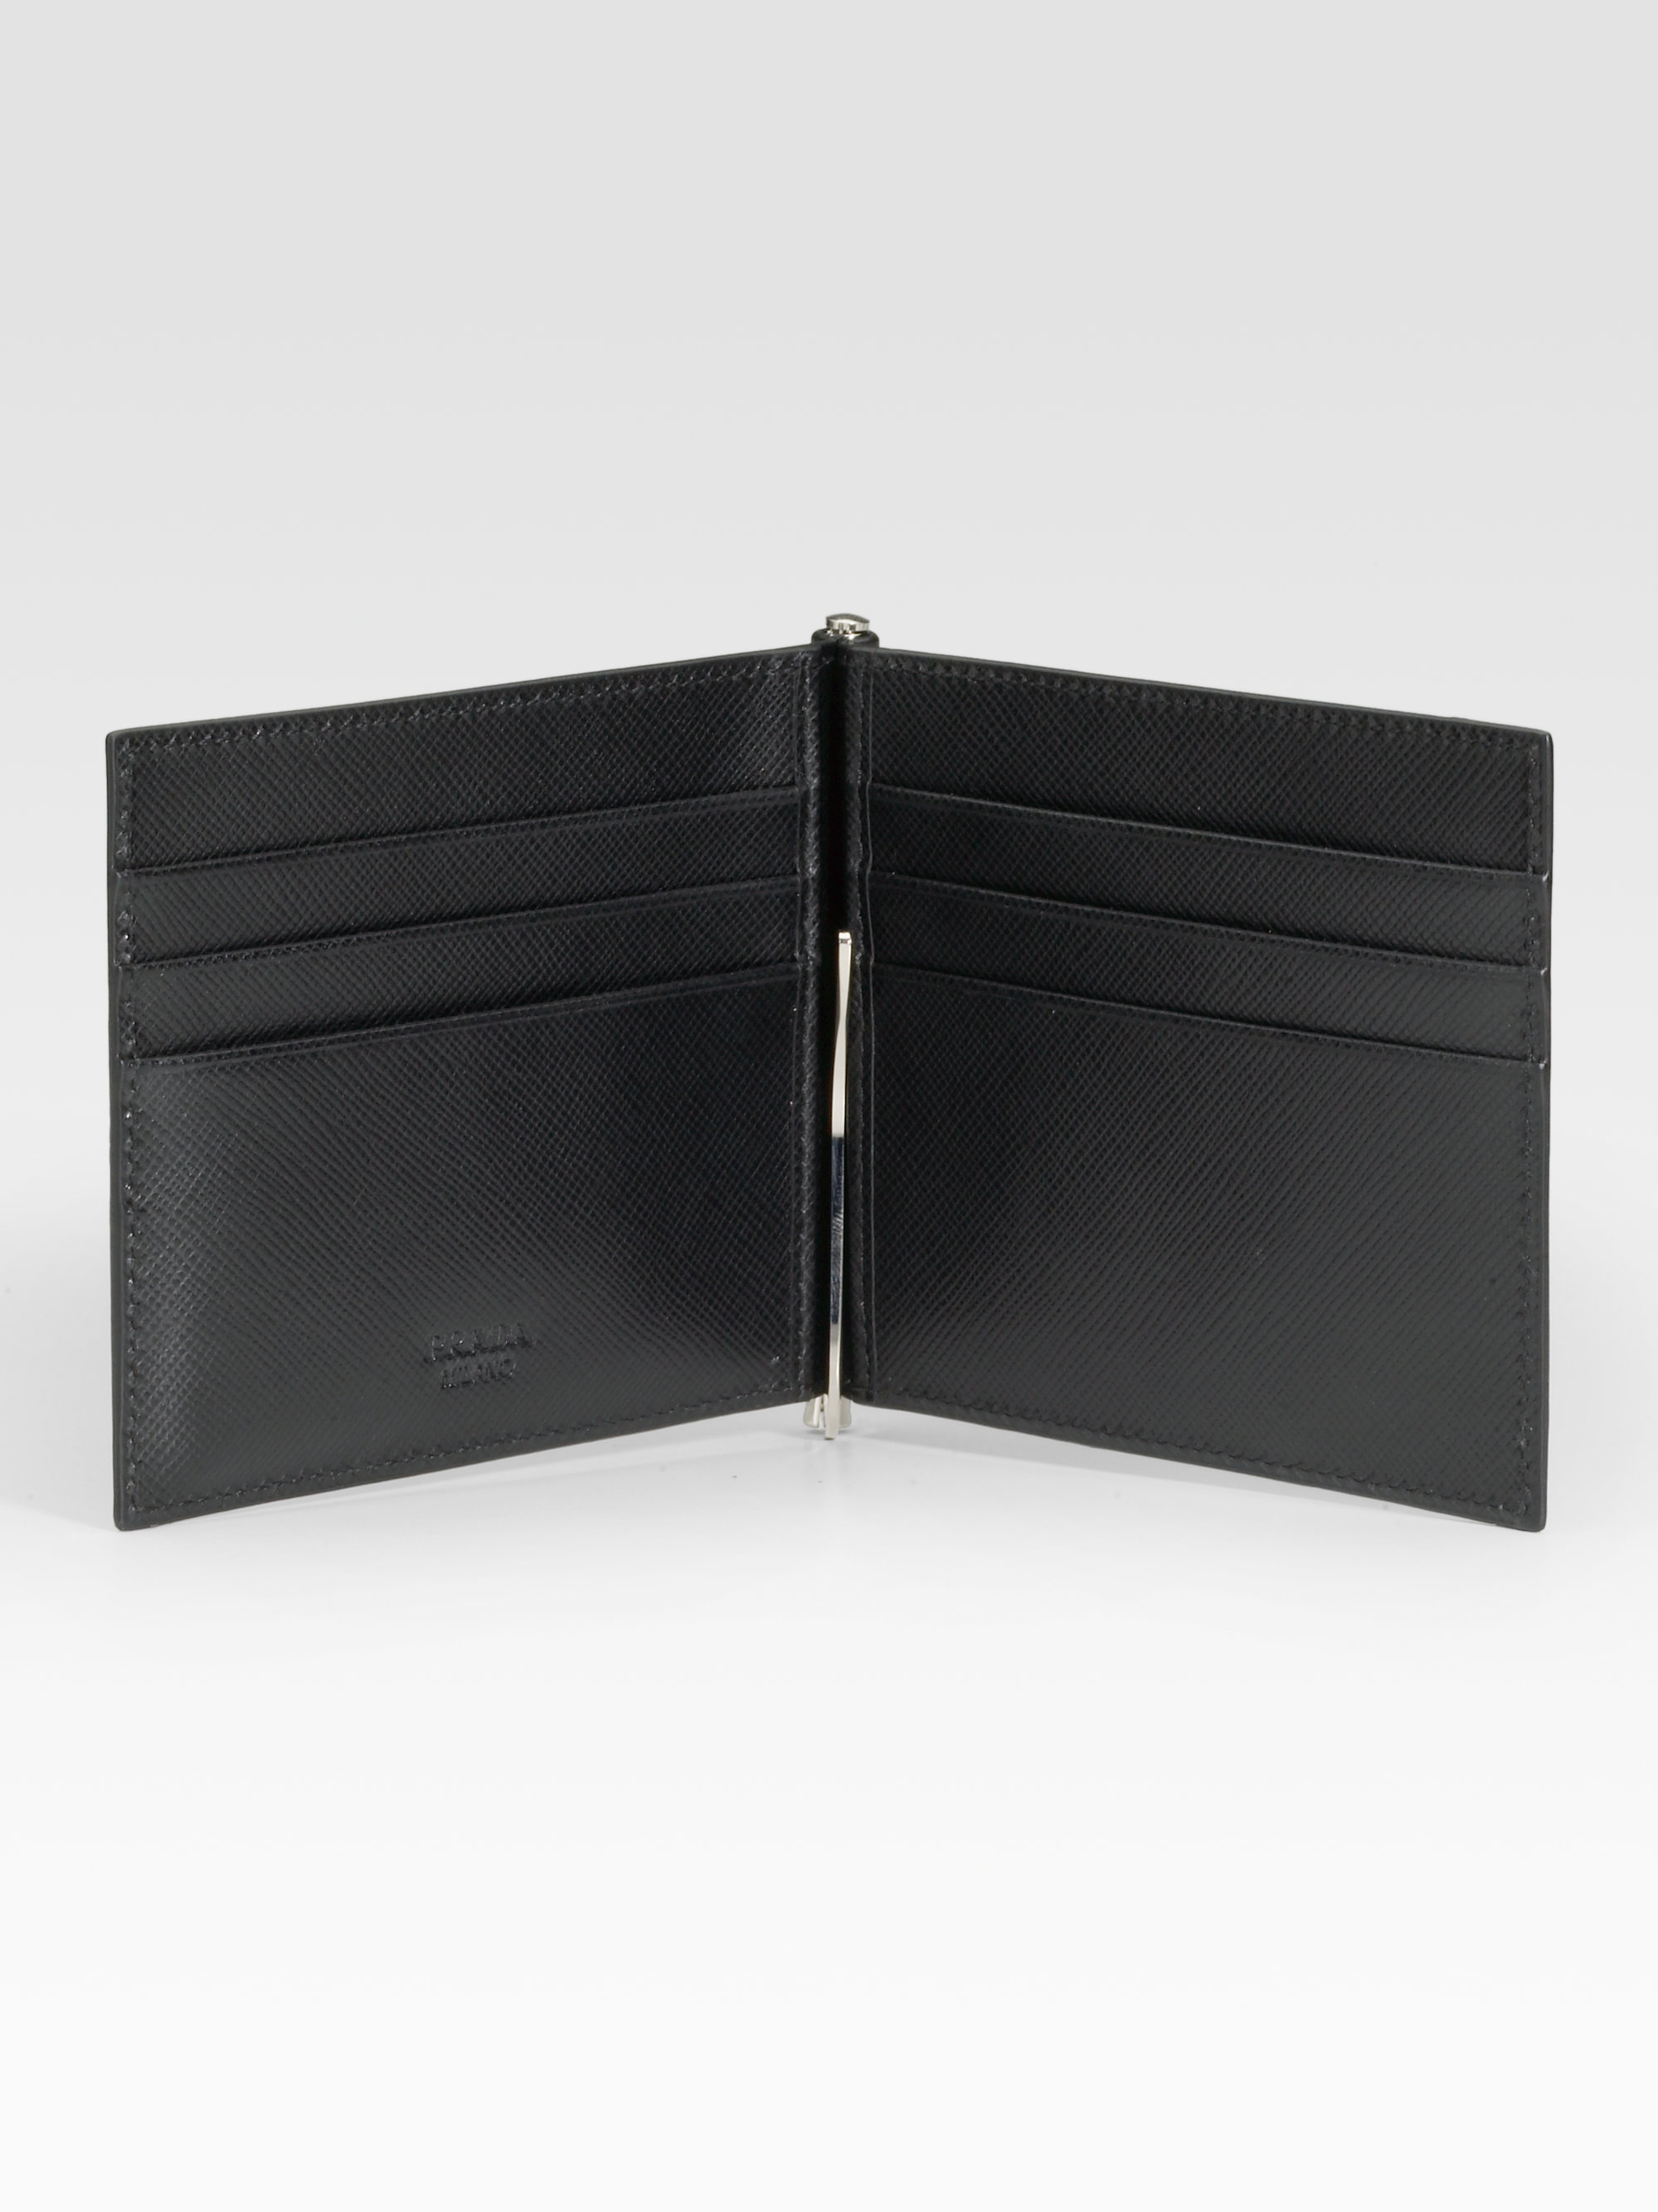 99e58a54 coupon for prada saffiano bifold wallet black 1050d 54cdb